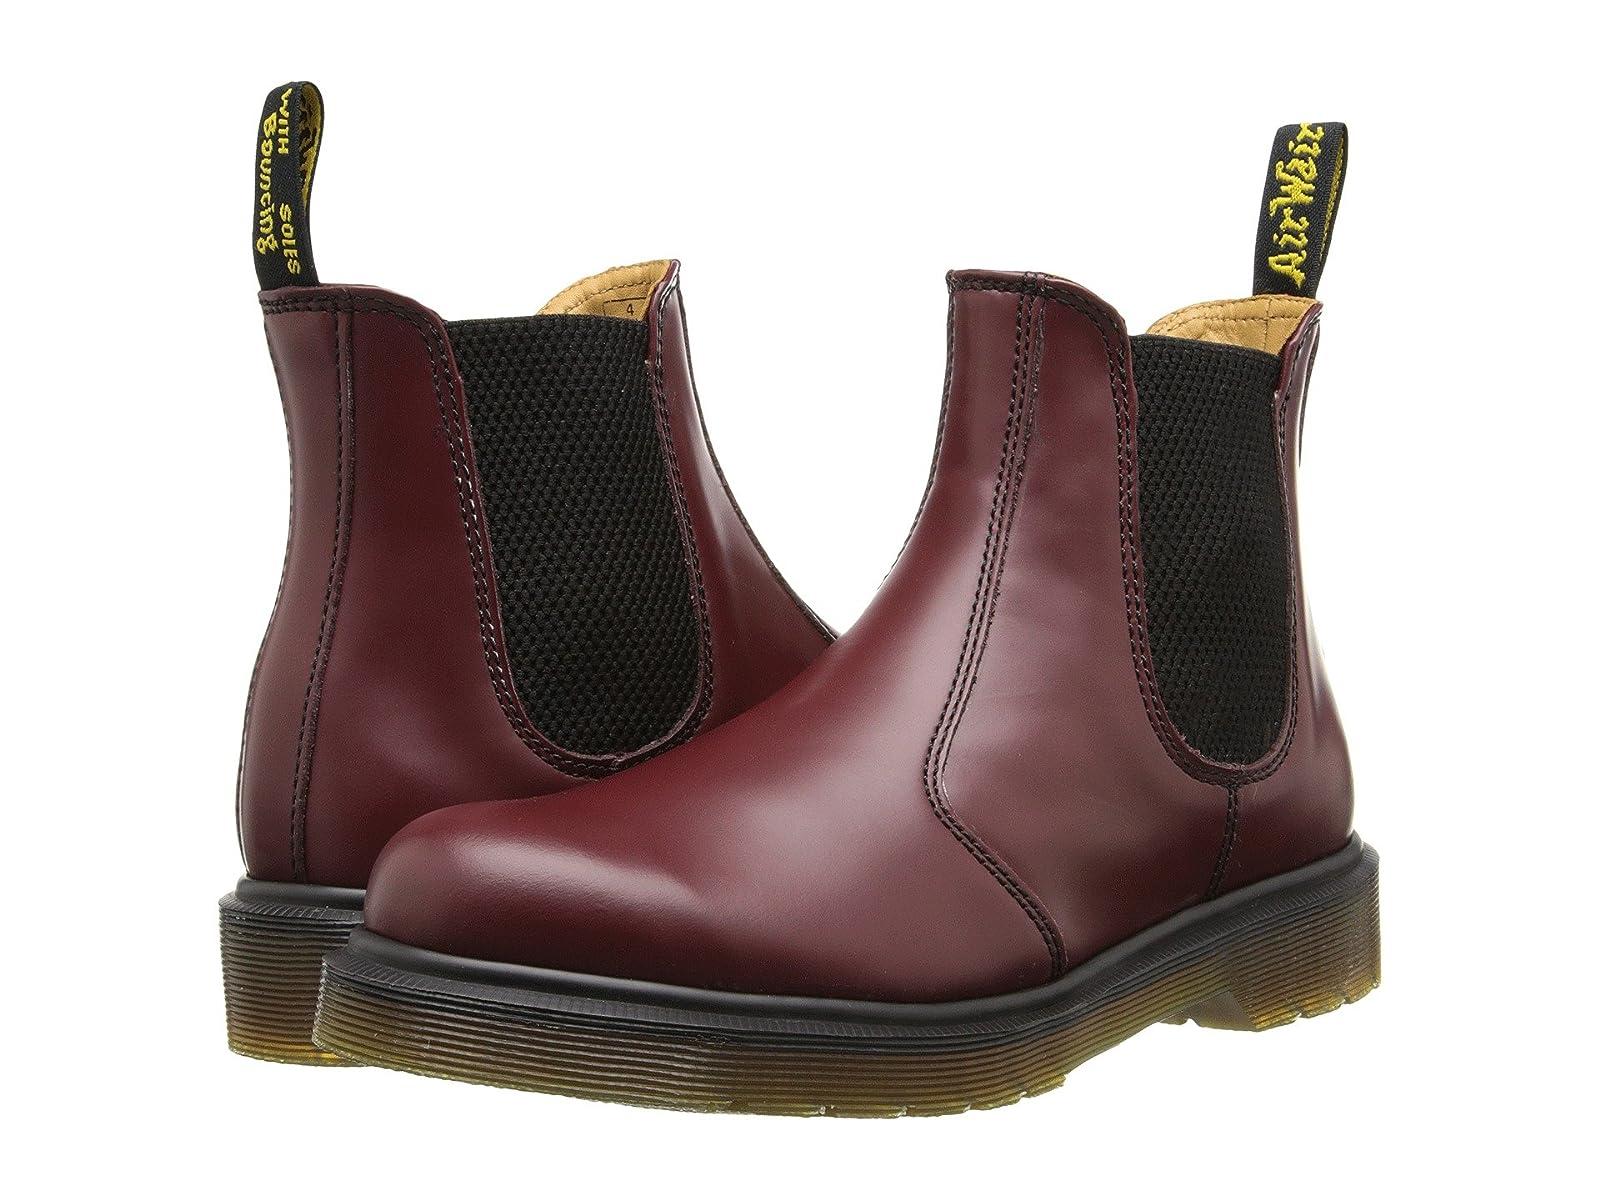 Dr. Martens 2976Affordable and distinctive shoes